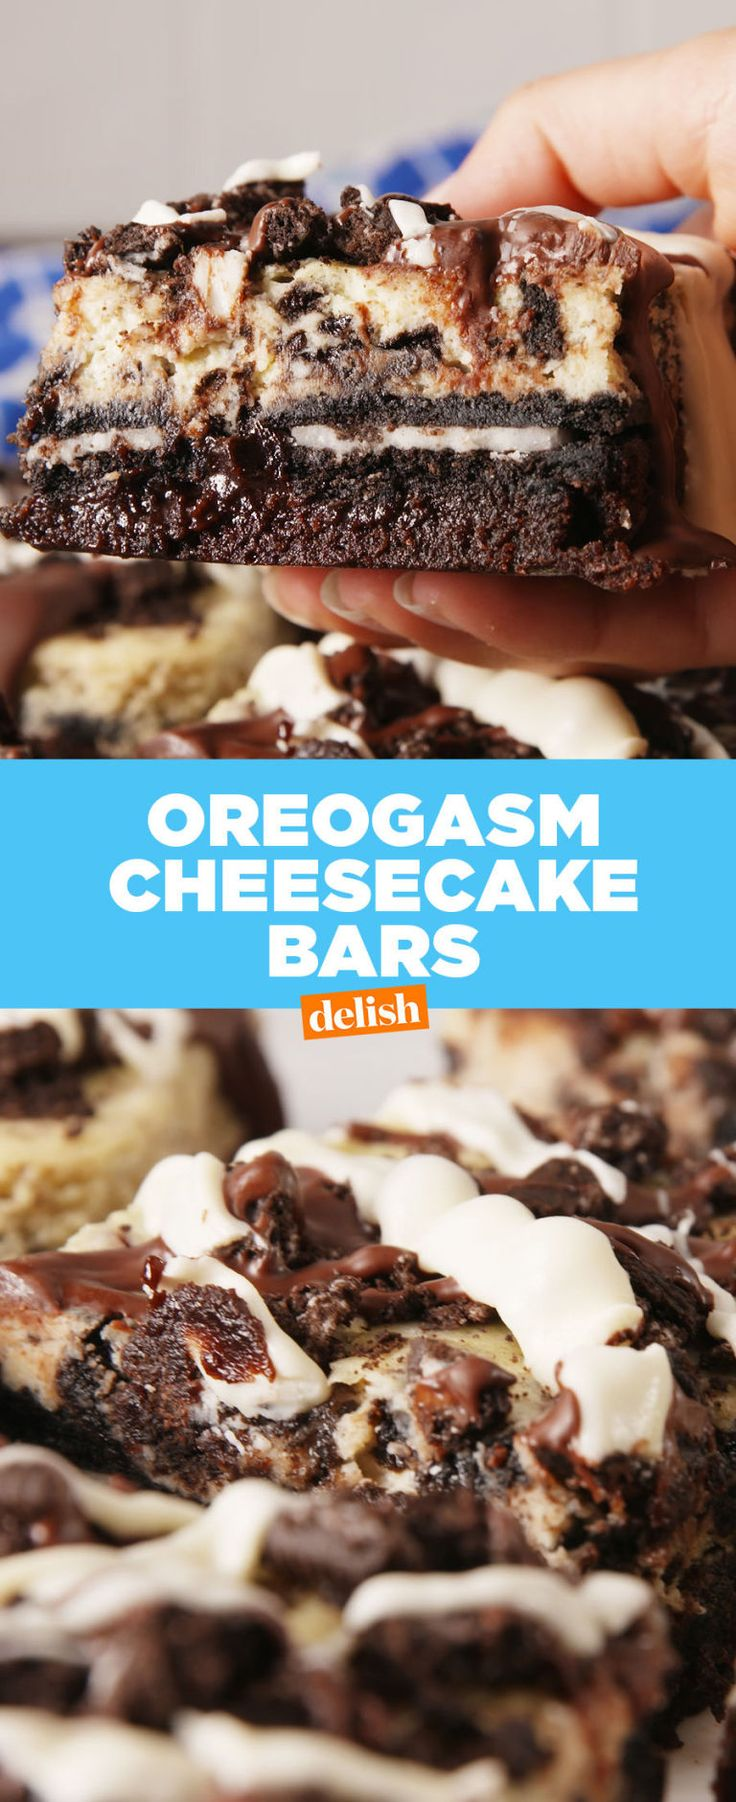 Oreogasm Cheesecake Bars